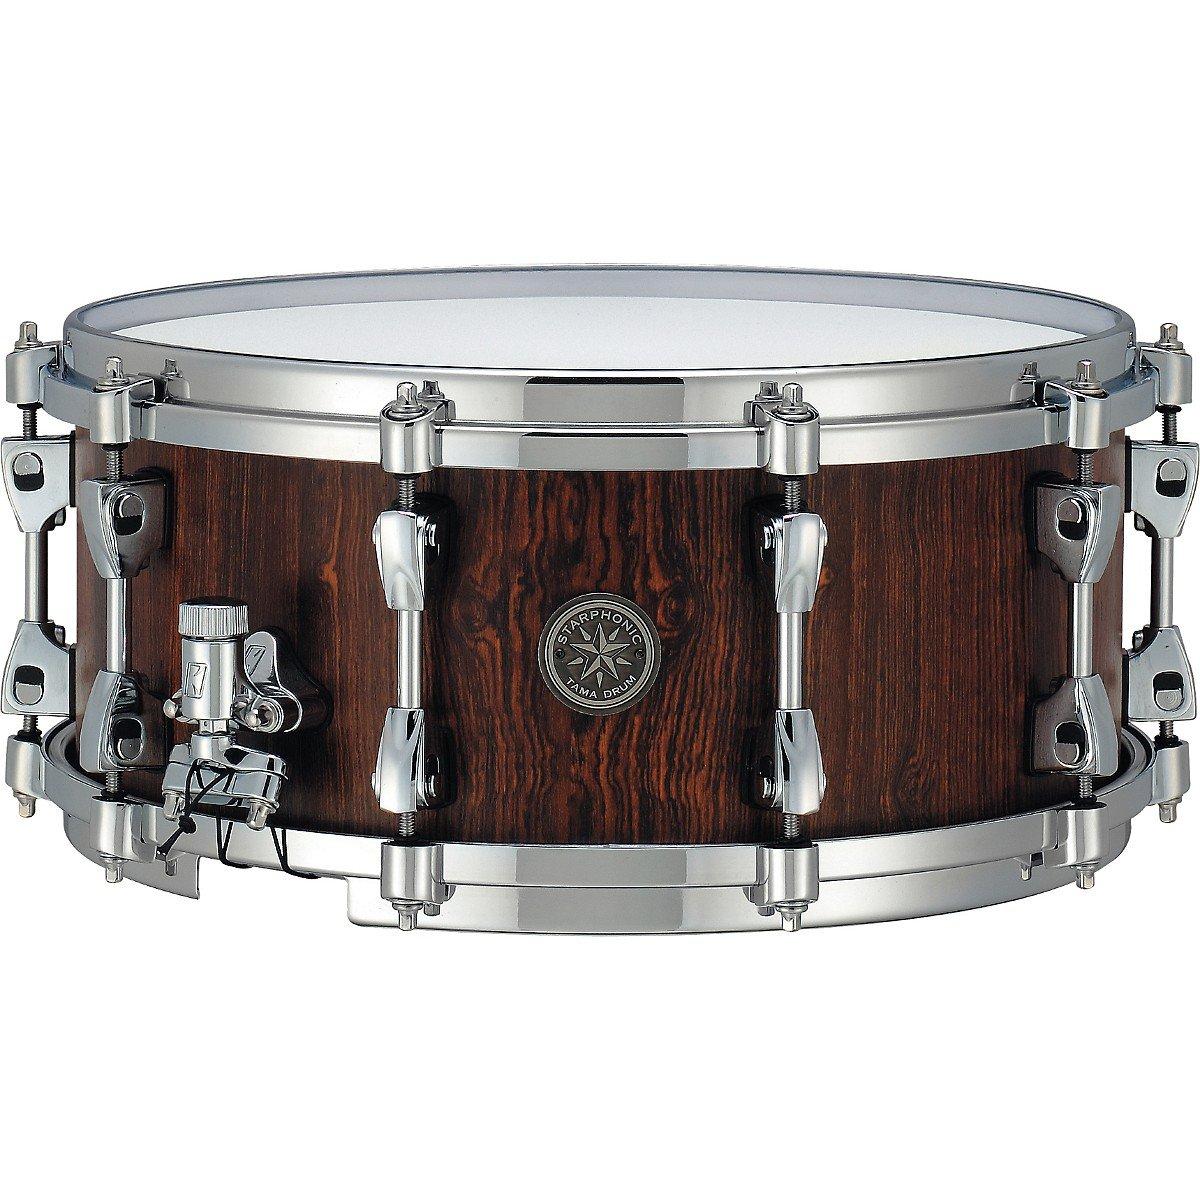 Get Quotations · Tama Starphonic Series Snare Drum - 6